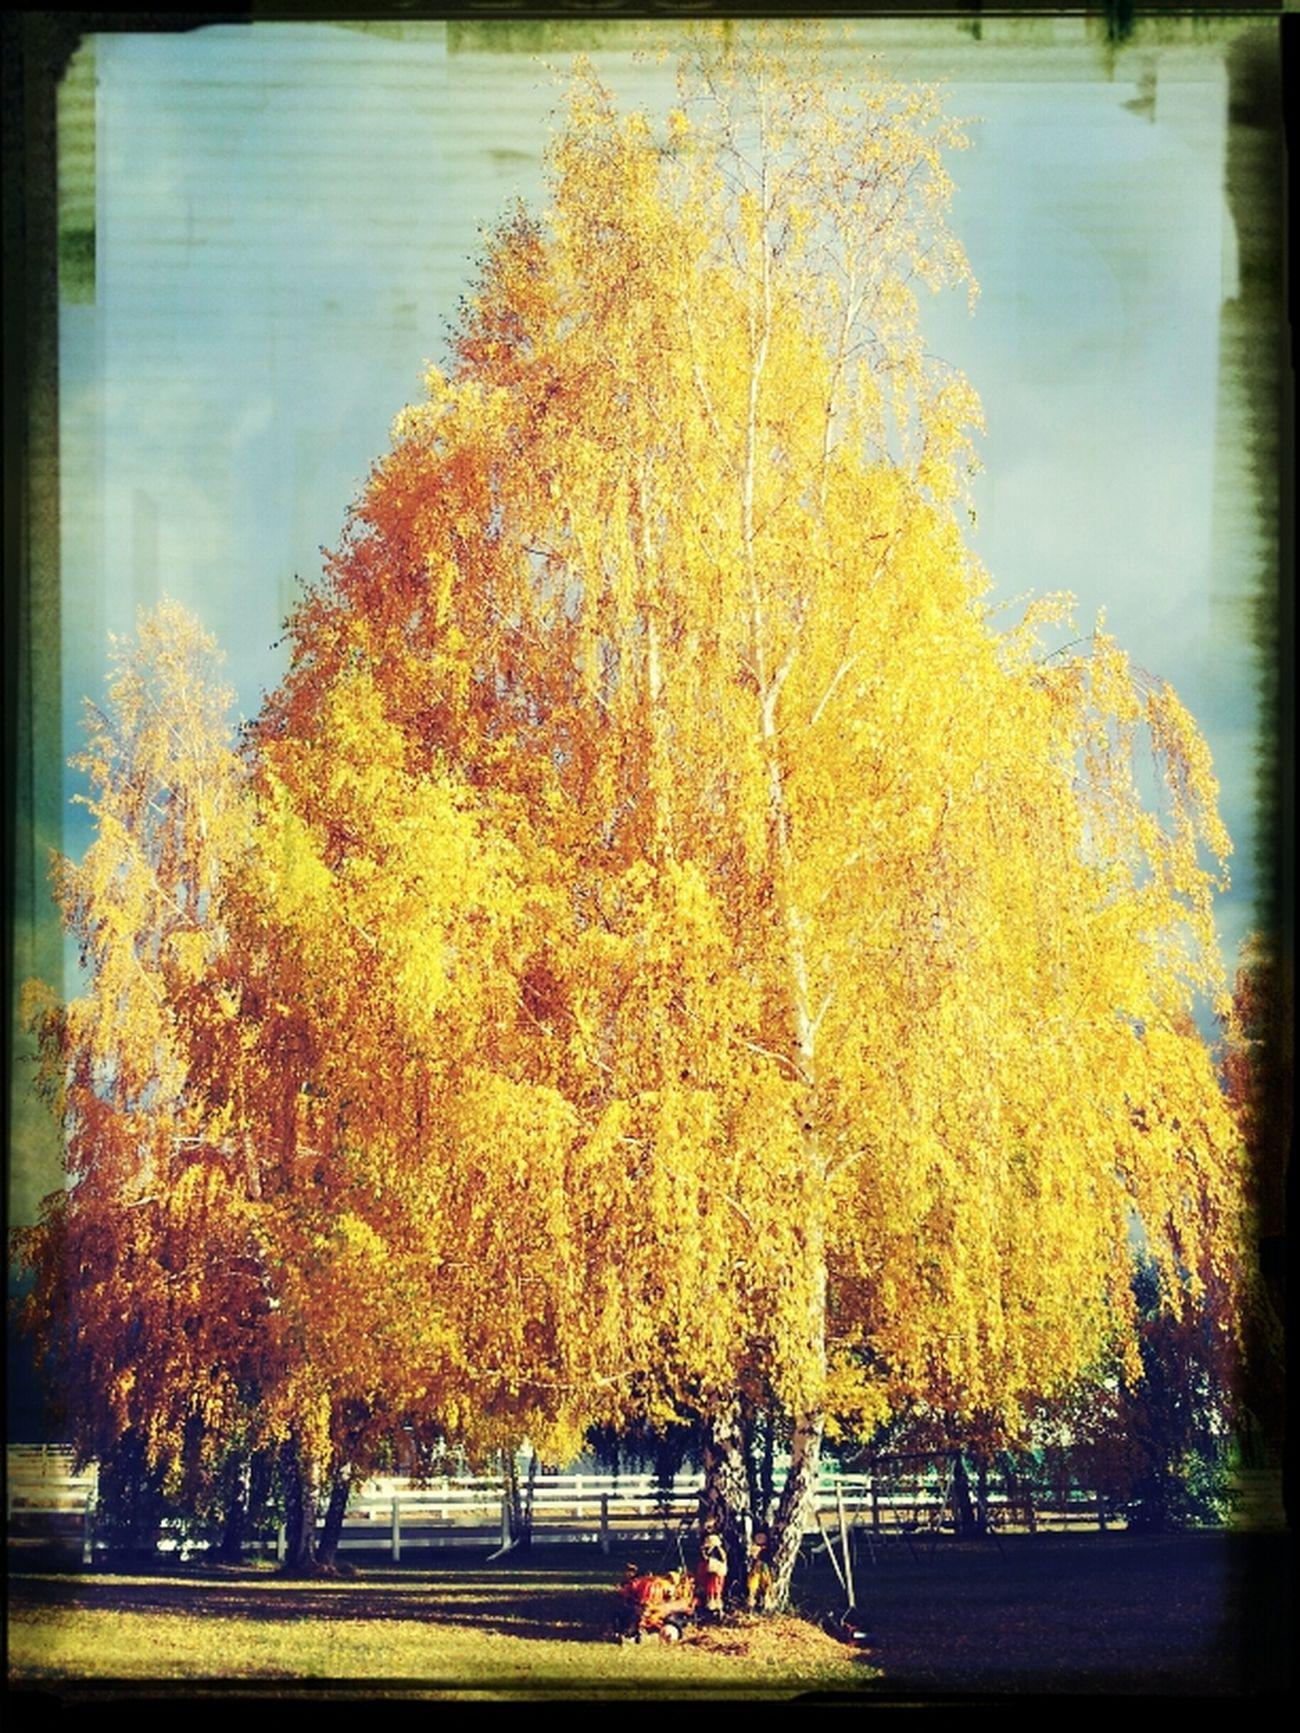 crisp air. ....warm colors. Fall is among us